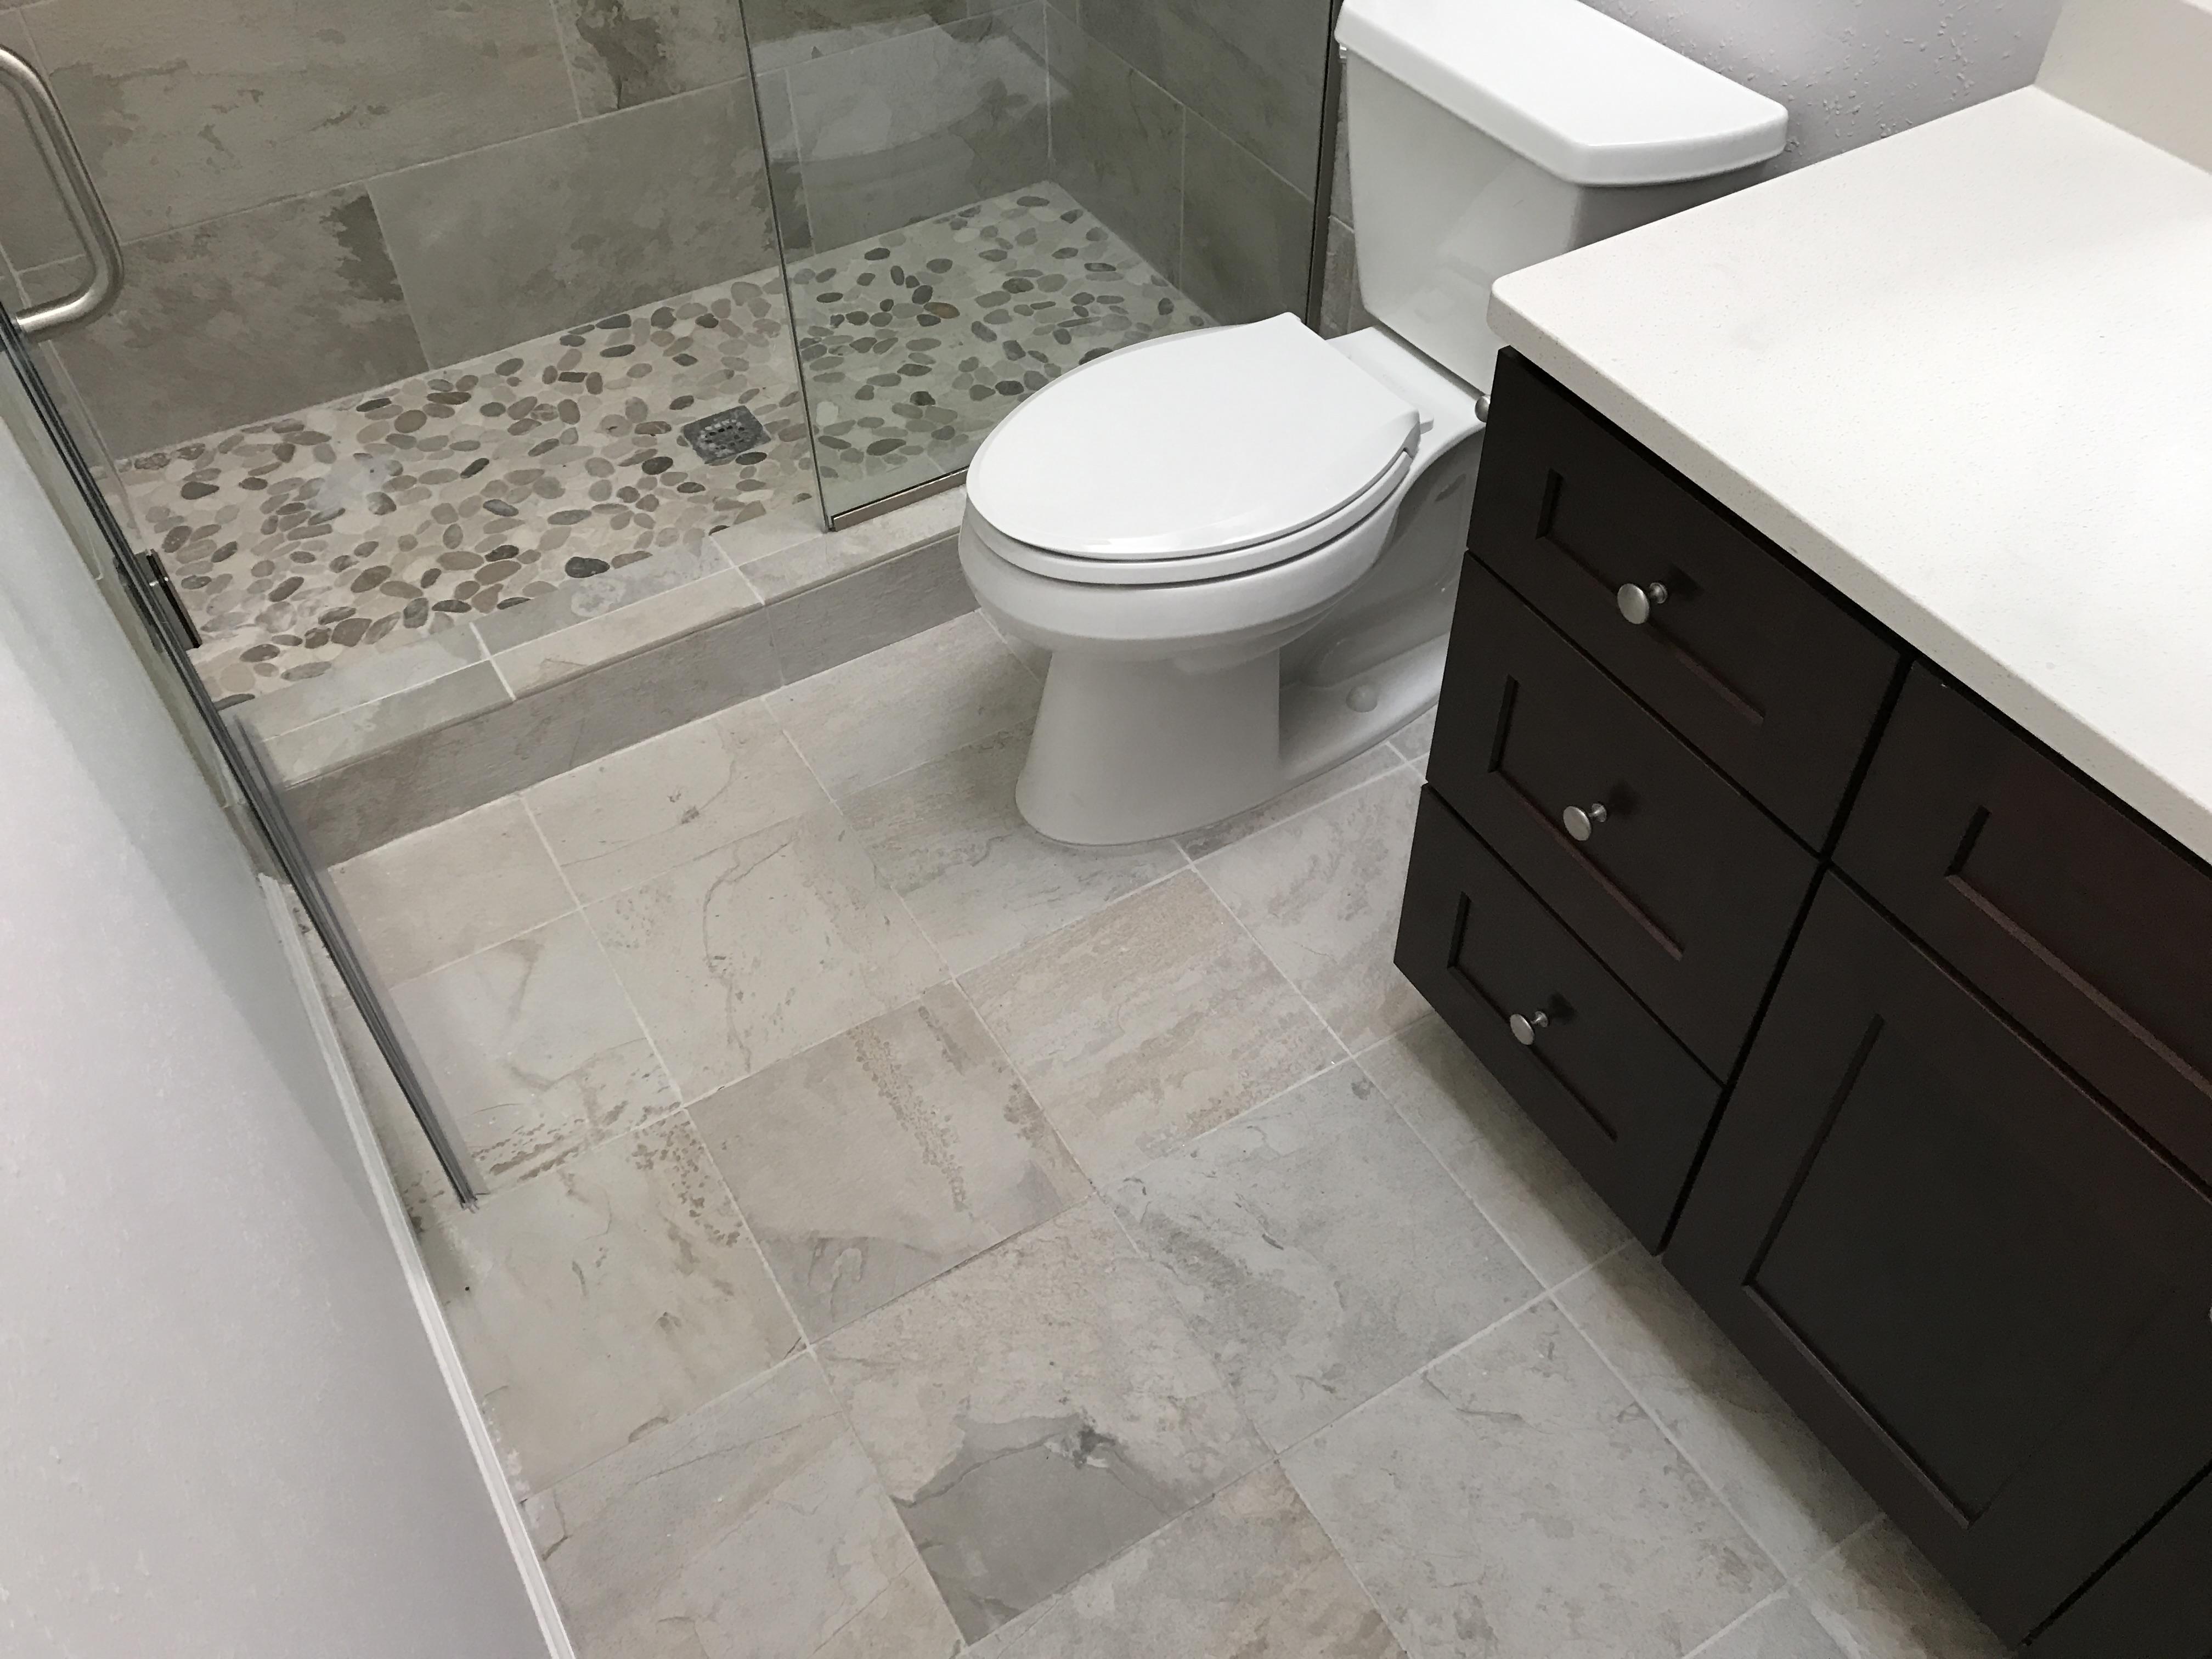 Bathroom Remodeling In Panama City Beach FL - Bathroom remodeling panama city beach